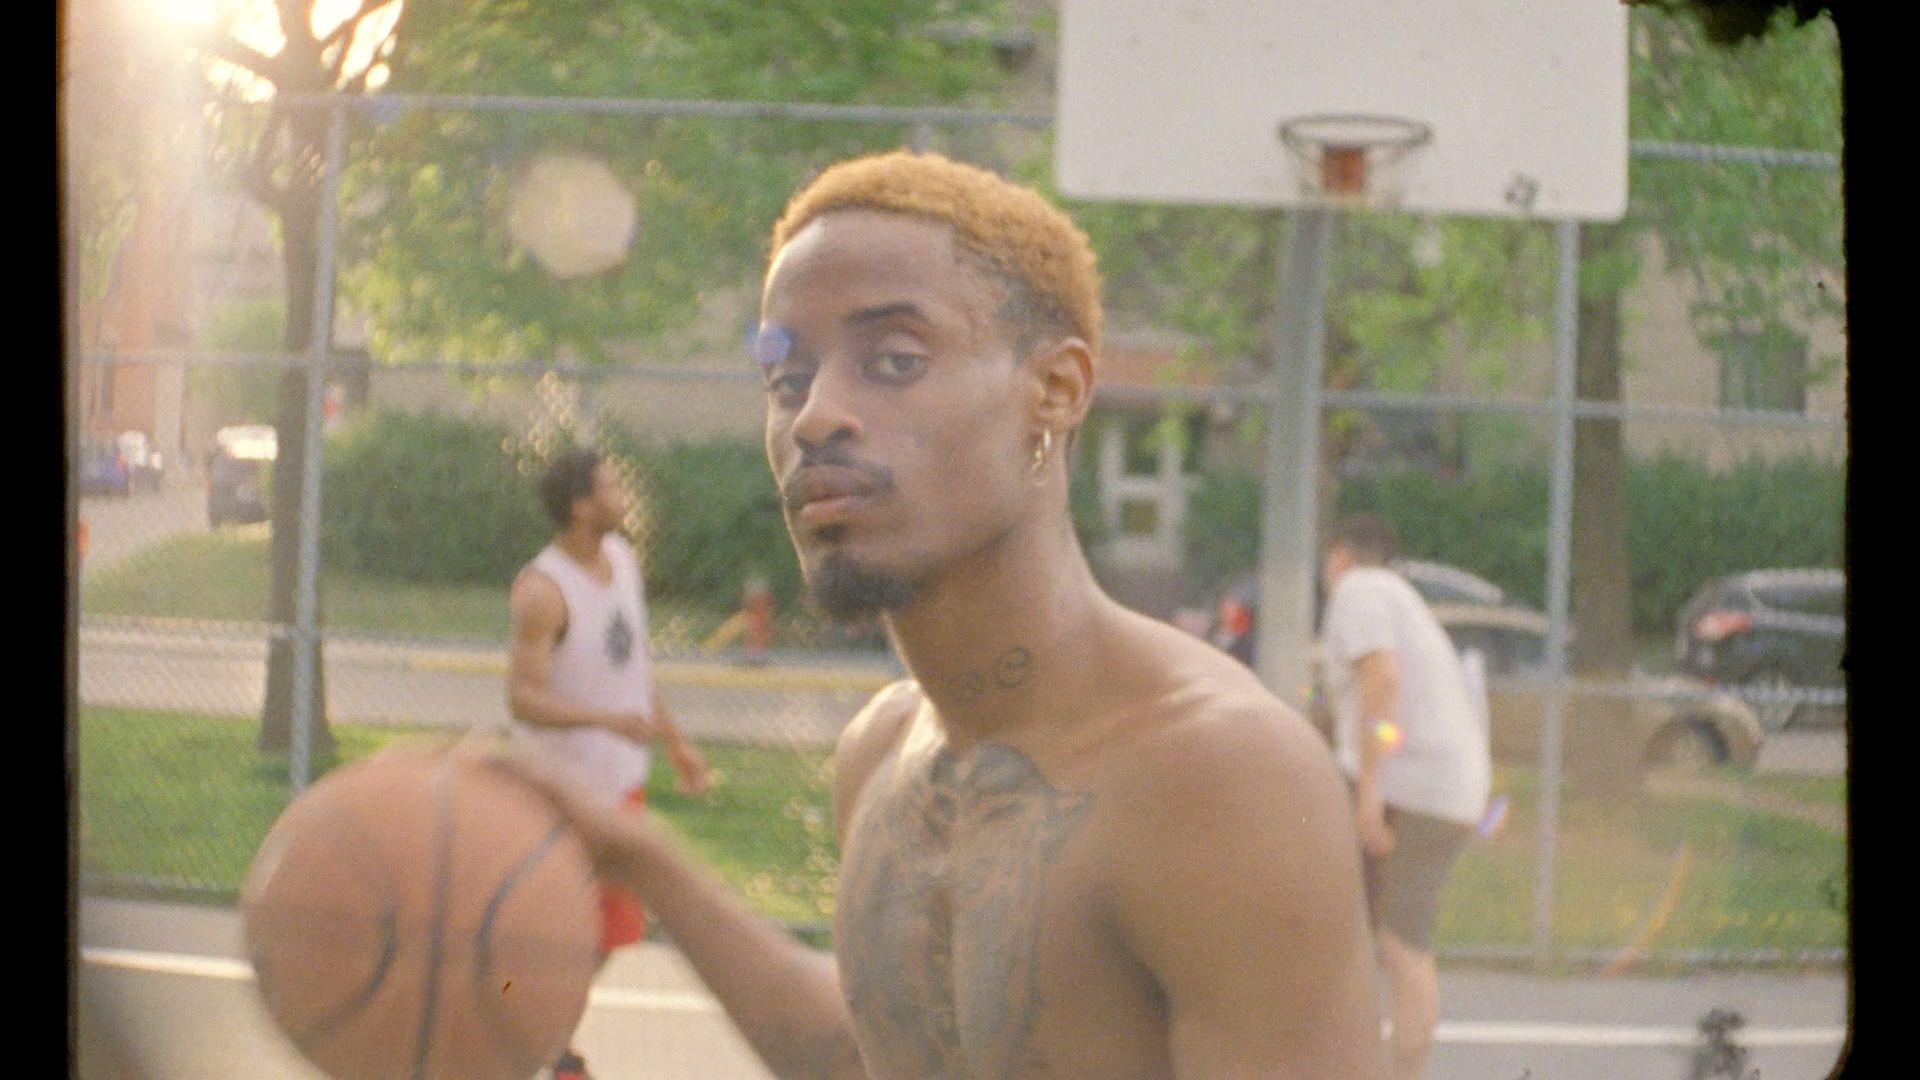 Nate Husser rap singer playing basketball in video La Beatmakerie filmed by Les Gamins